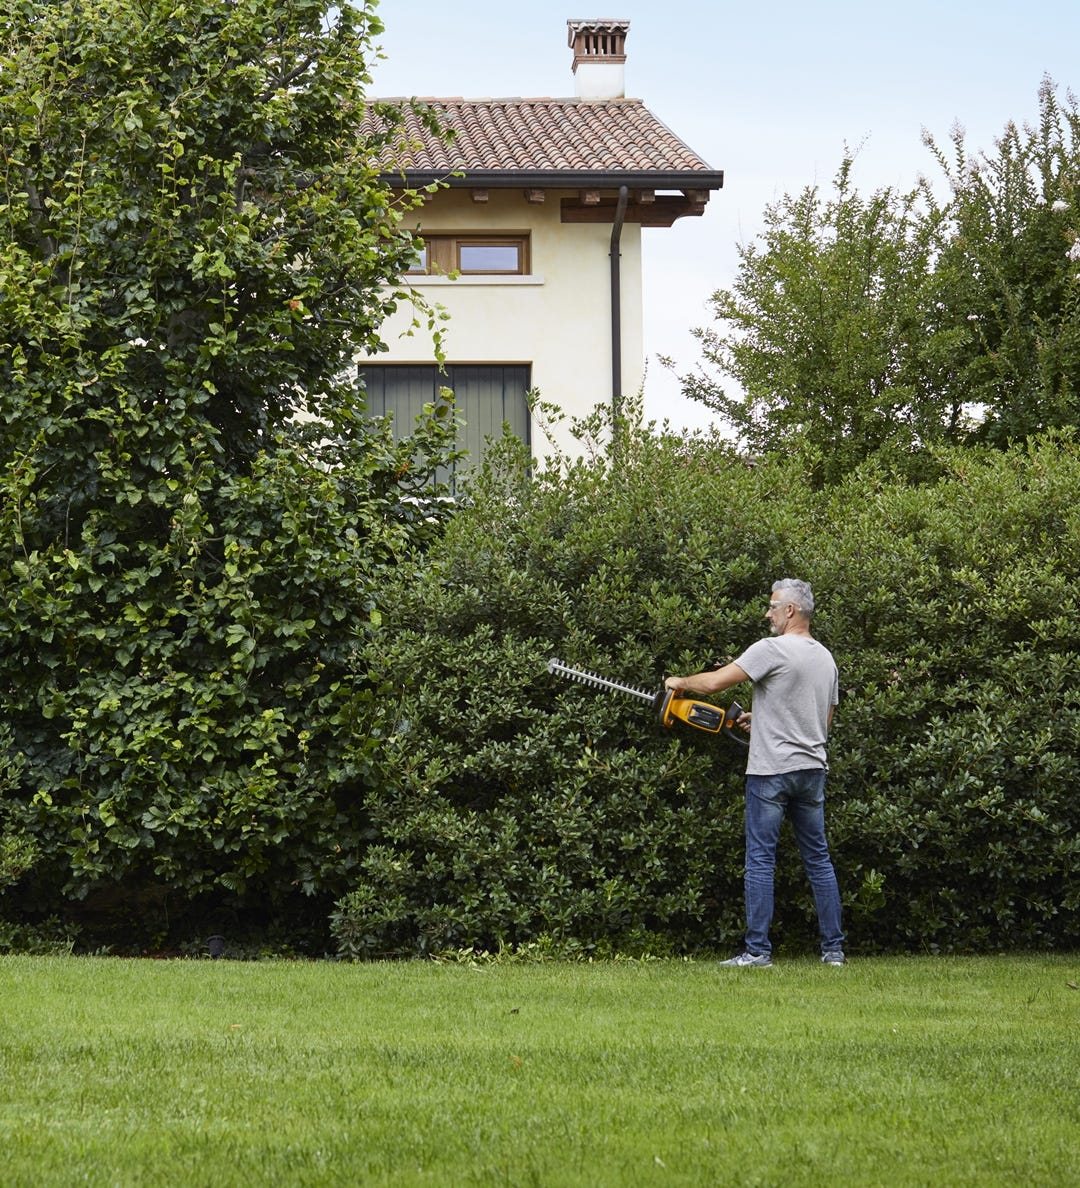 stiga-outils-jardinage-sans fil-batterie